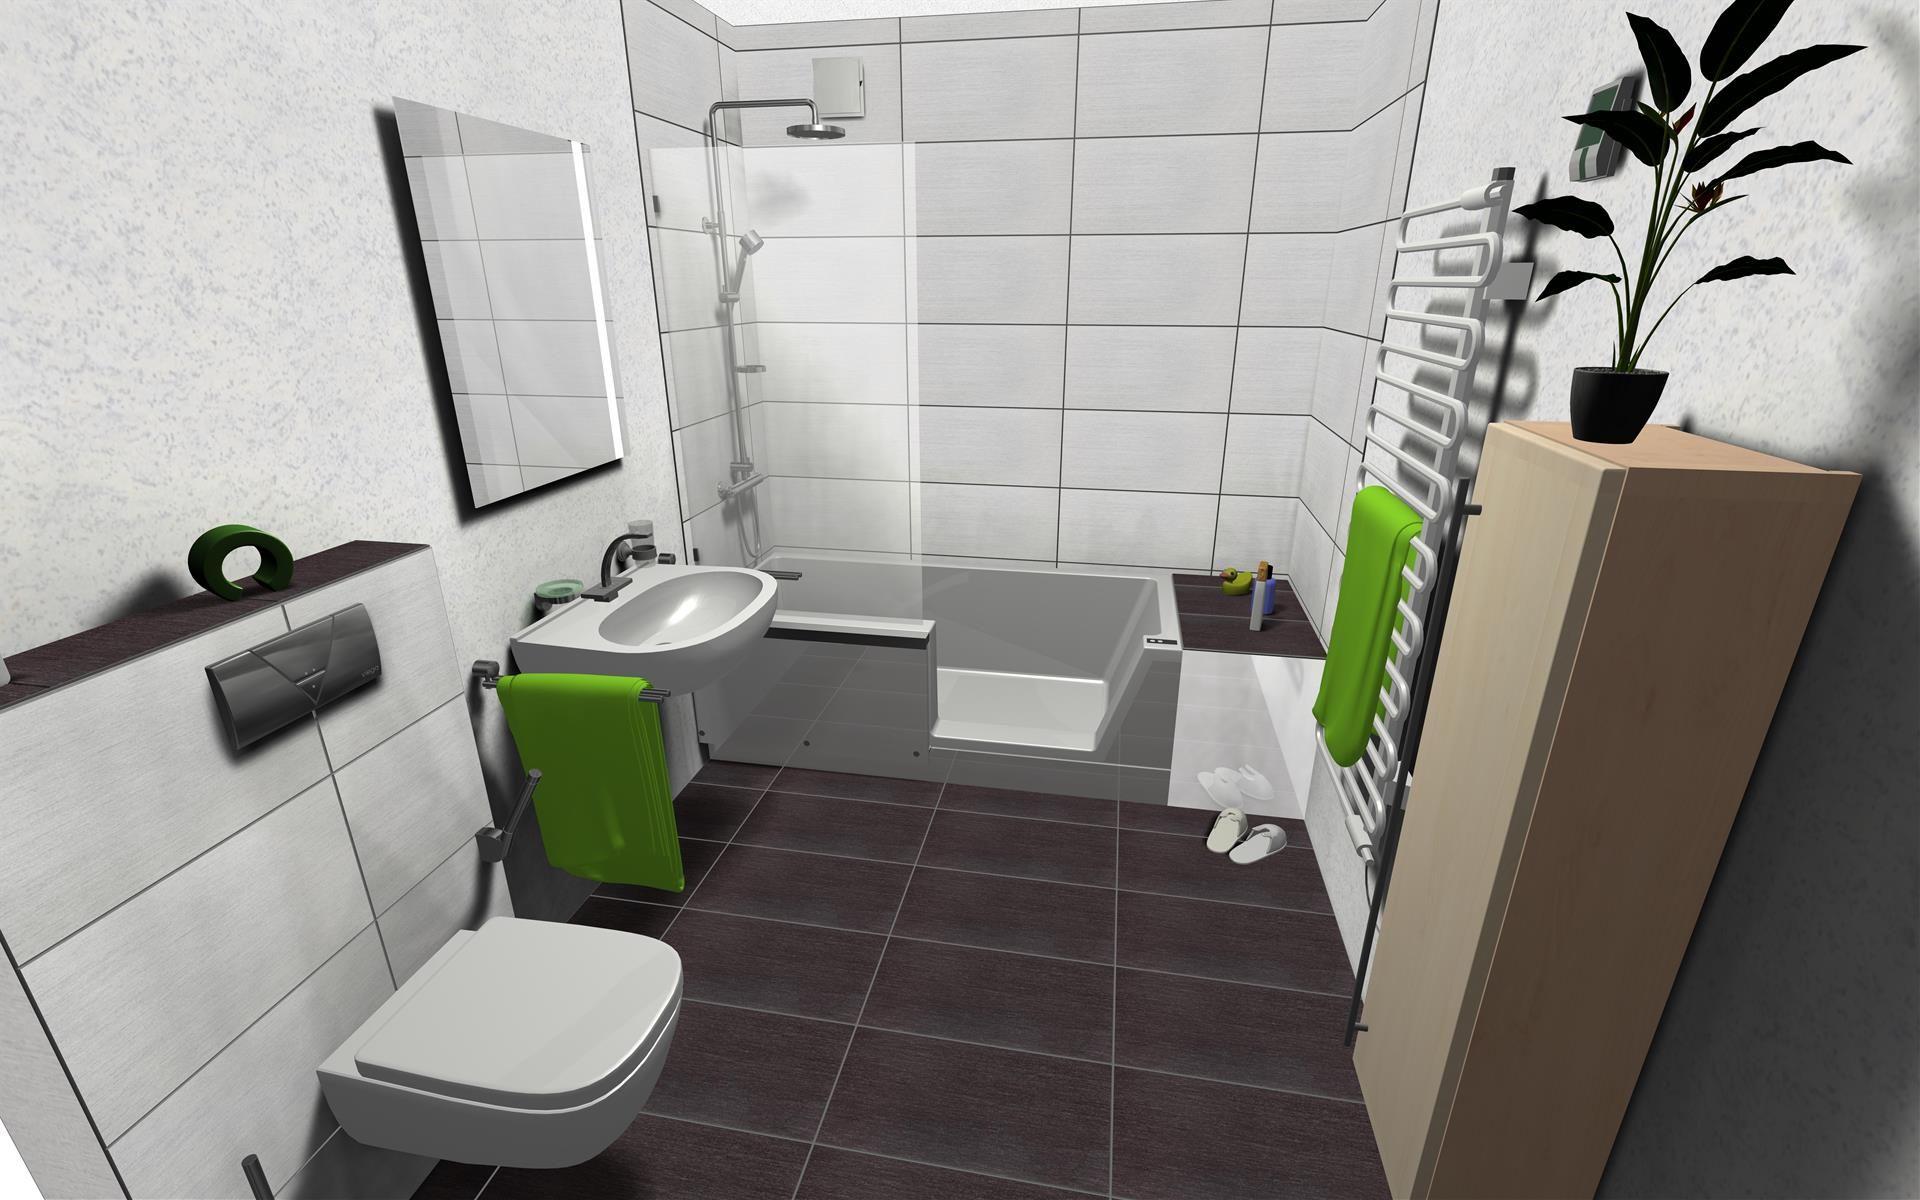 Badezimmer Designer Software Badezimmer Planen Badezimmer Online Planen Bodenbelag Fur Badezimmer